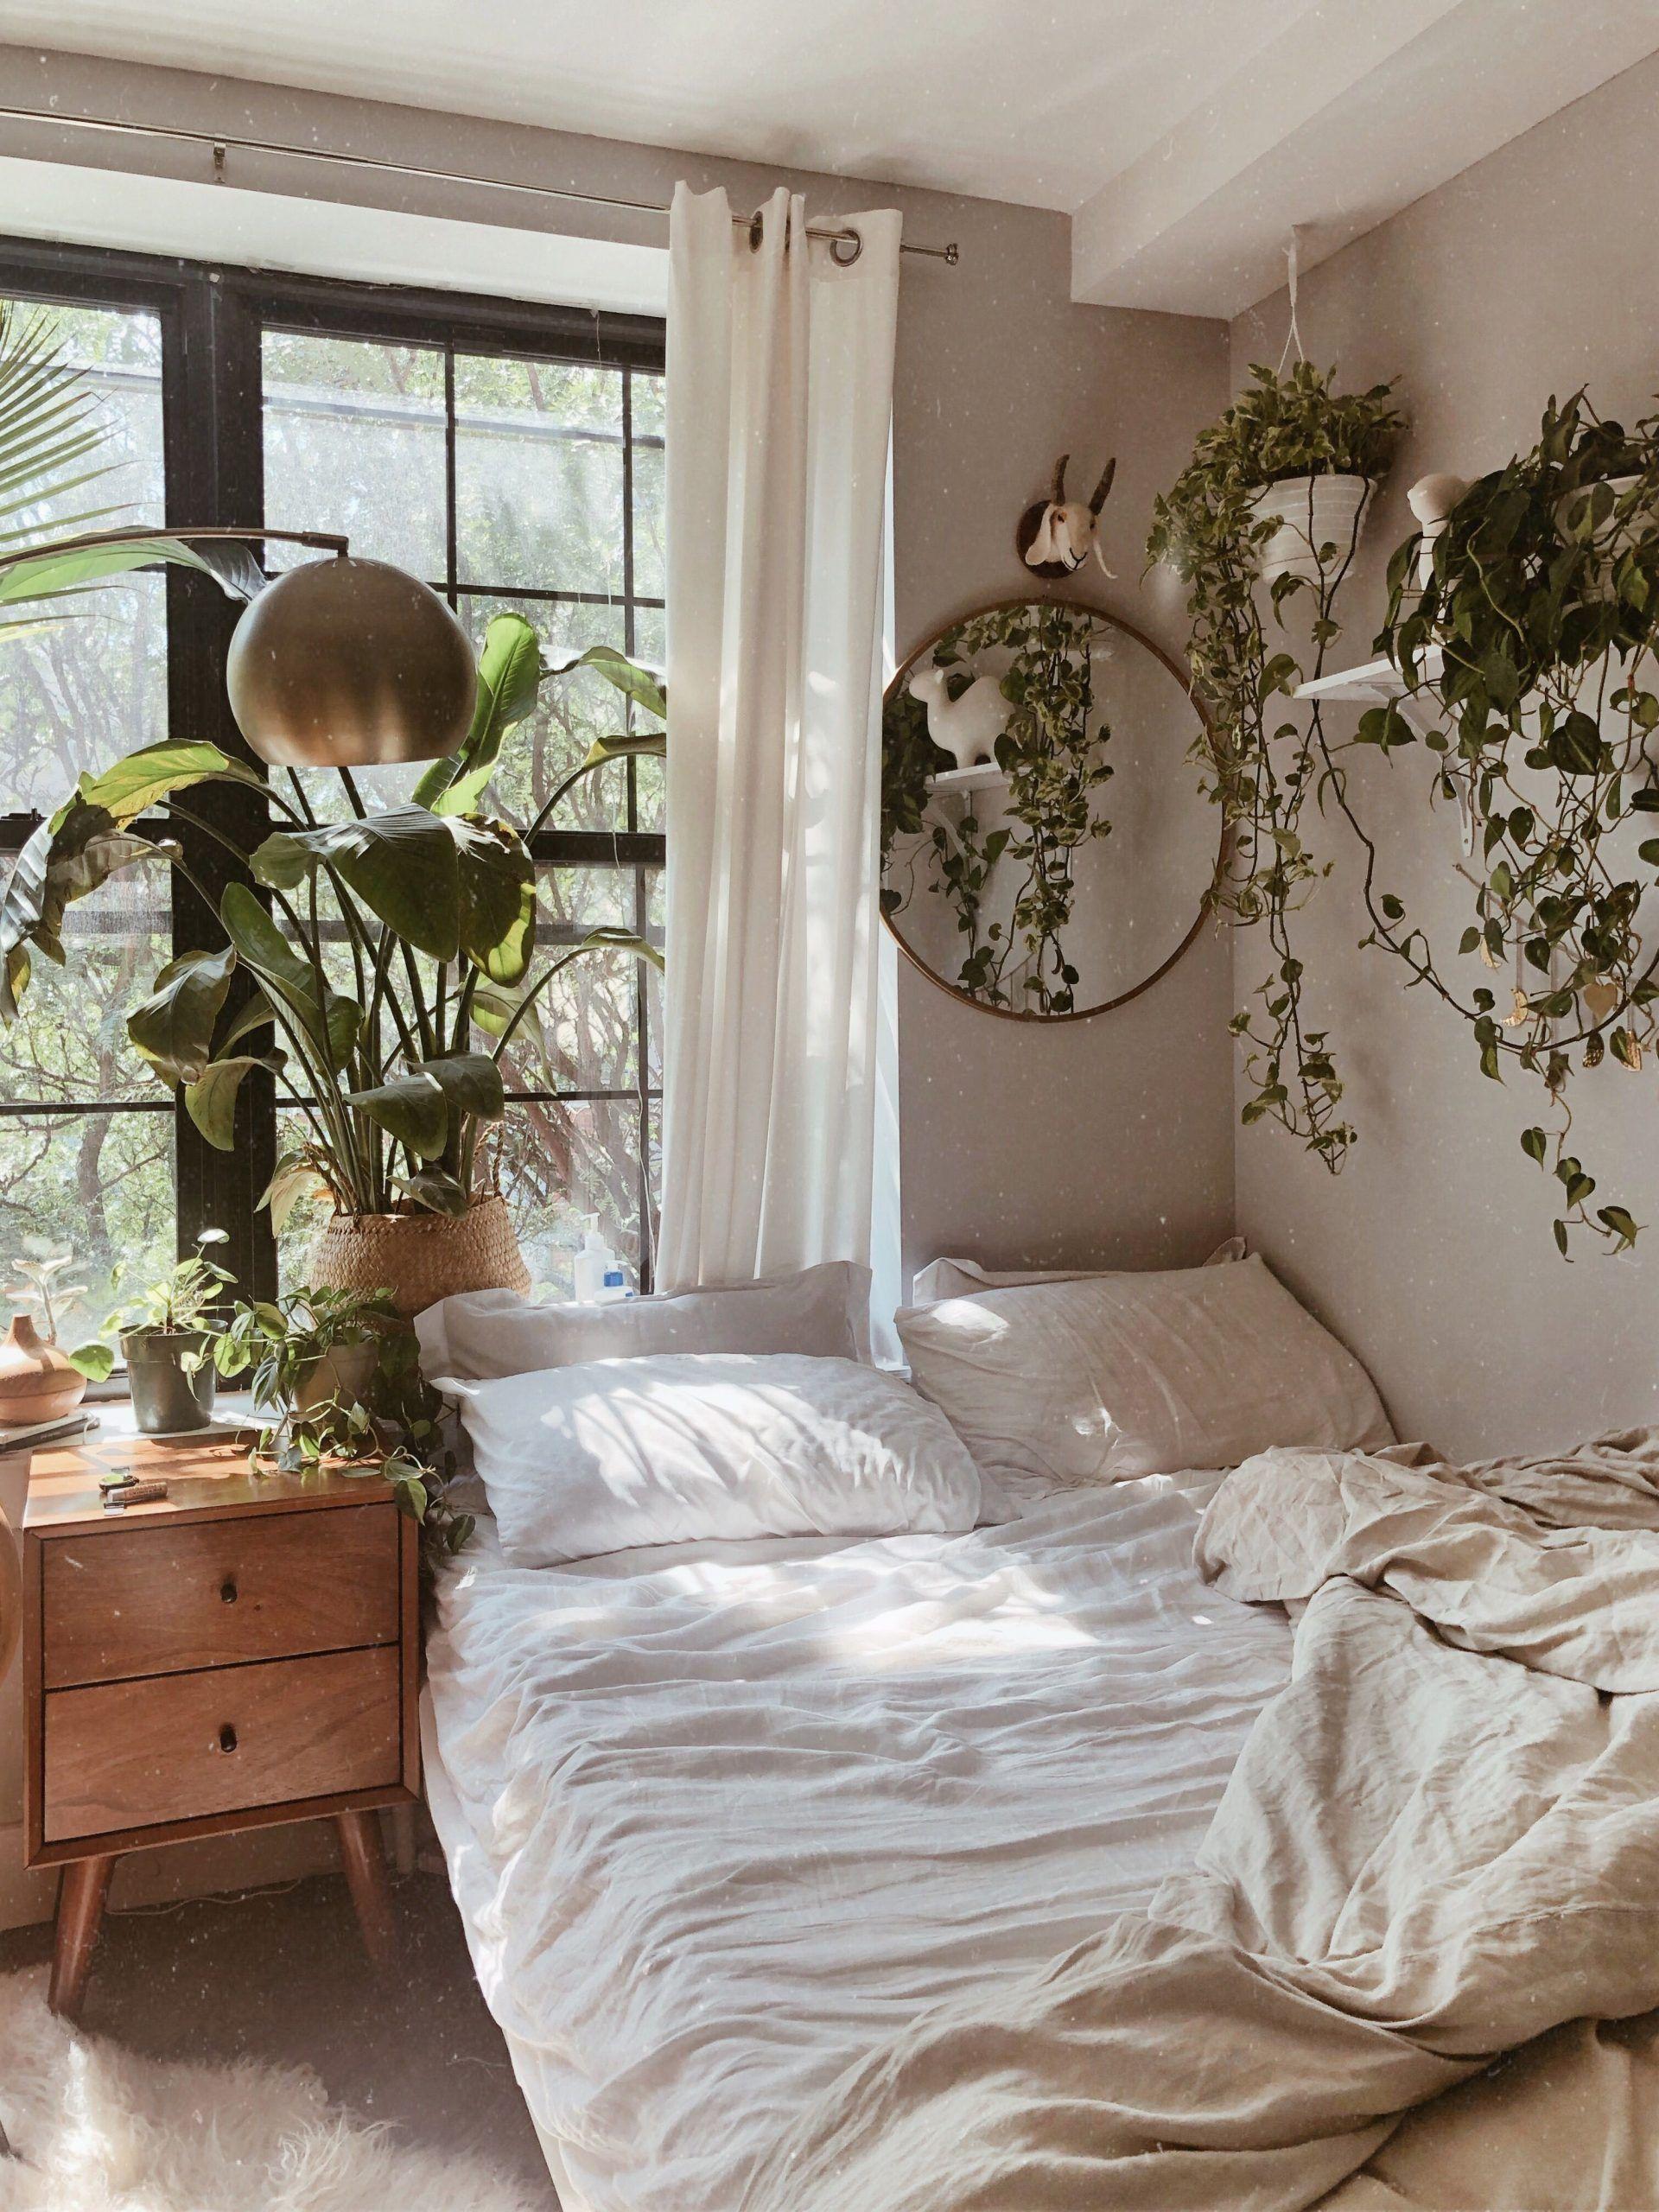 Minimalist Boho Bedroom Decor Bedroom Boho Decor Minimal